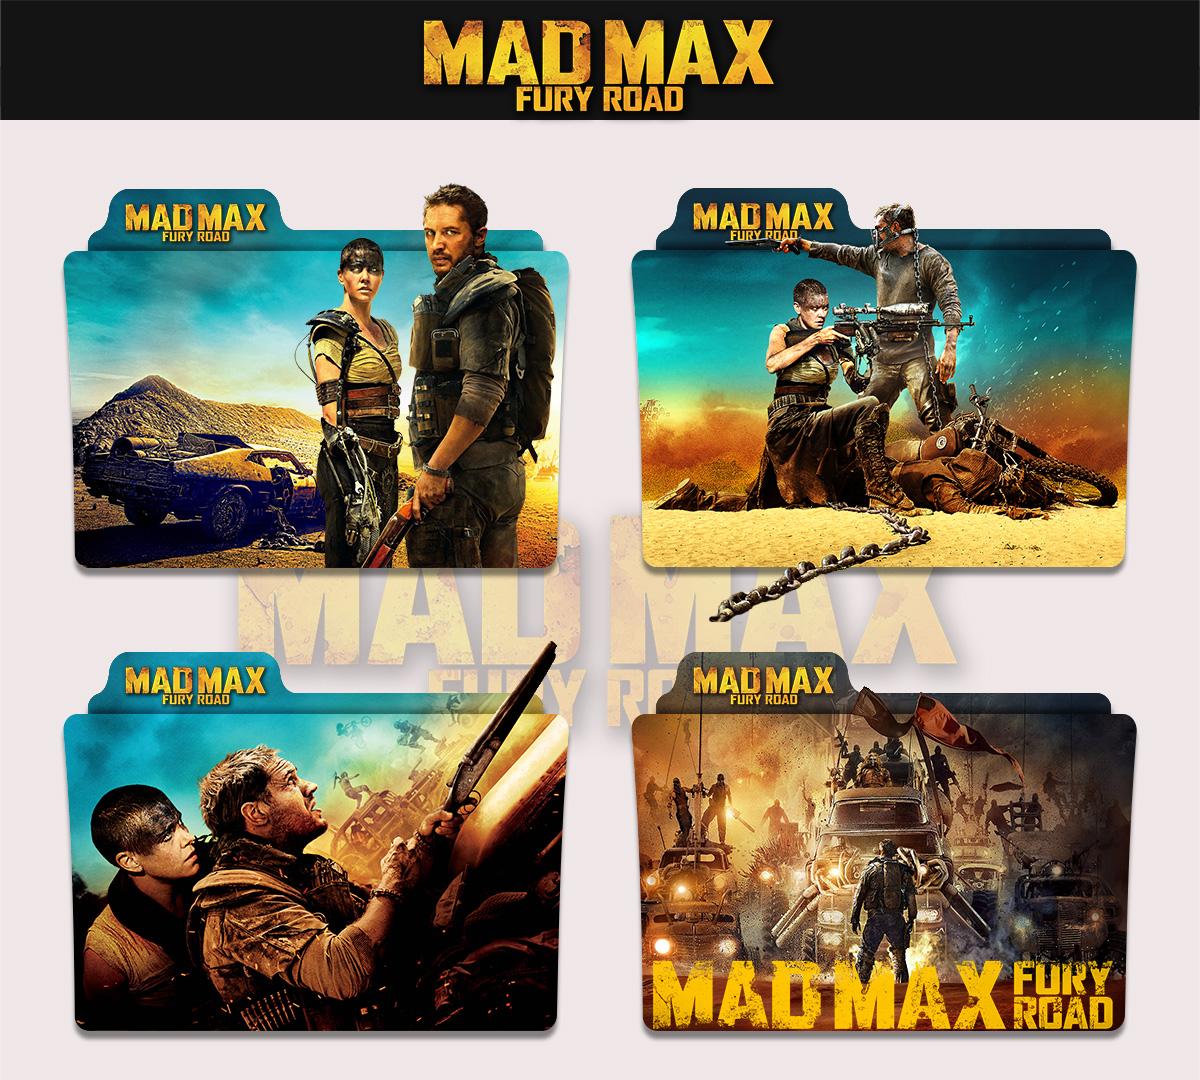 Mad Max Fury Road 2015 Folder Icon By Sonerbyzt On Deviantart